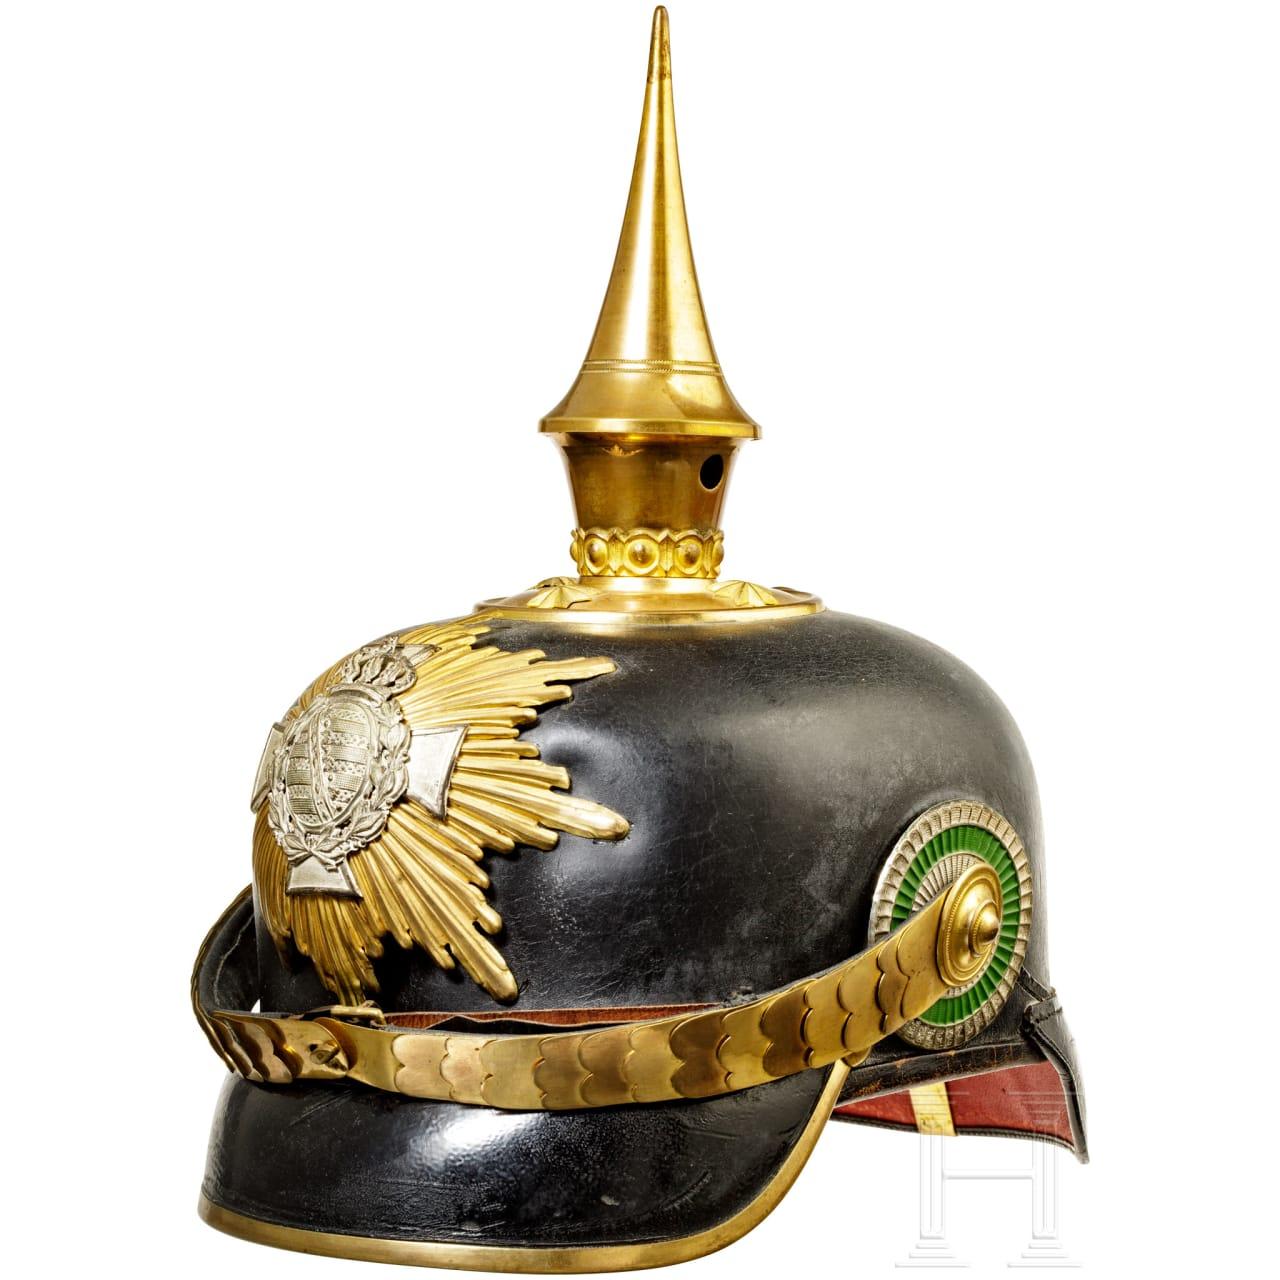 Helmet for reserve officers, c. 1910